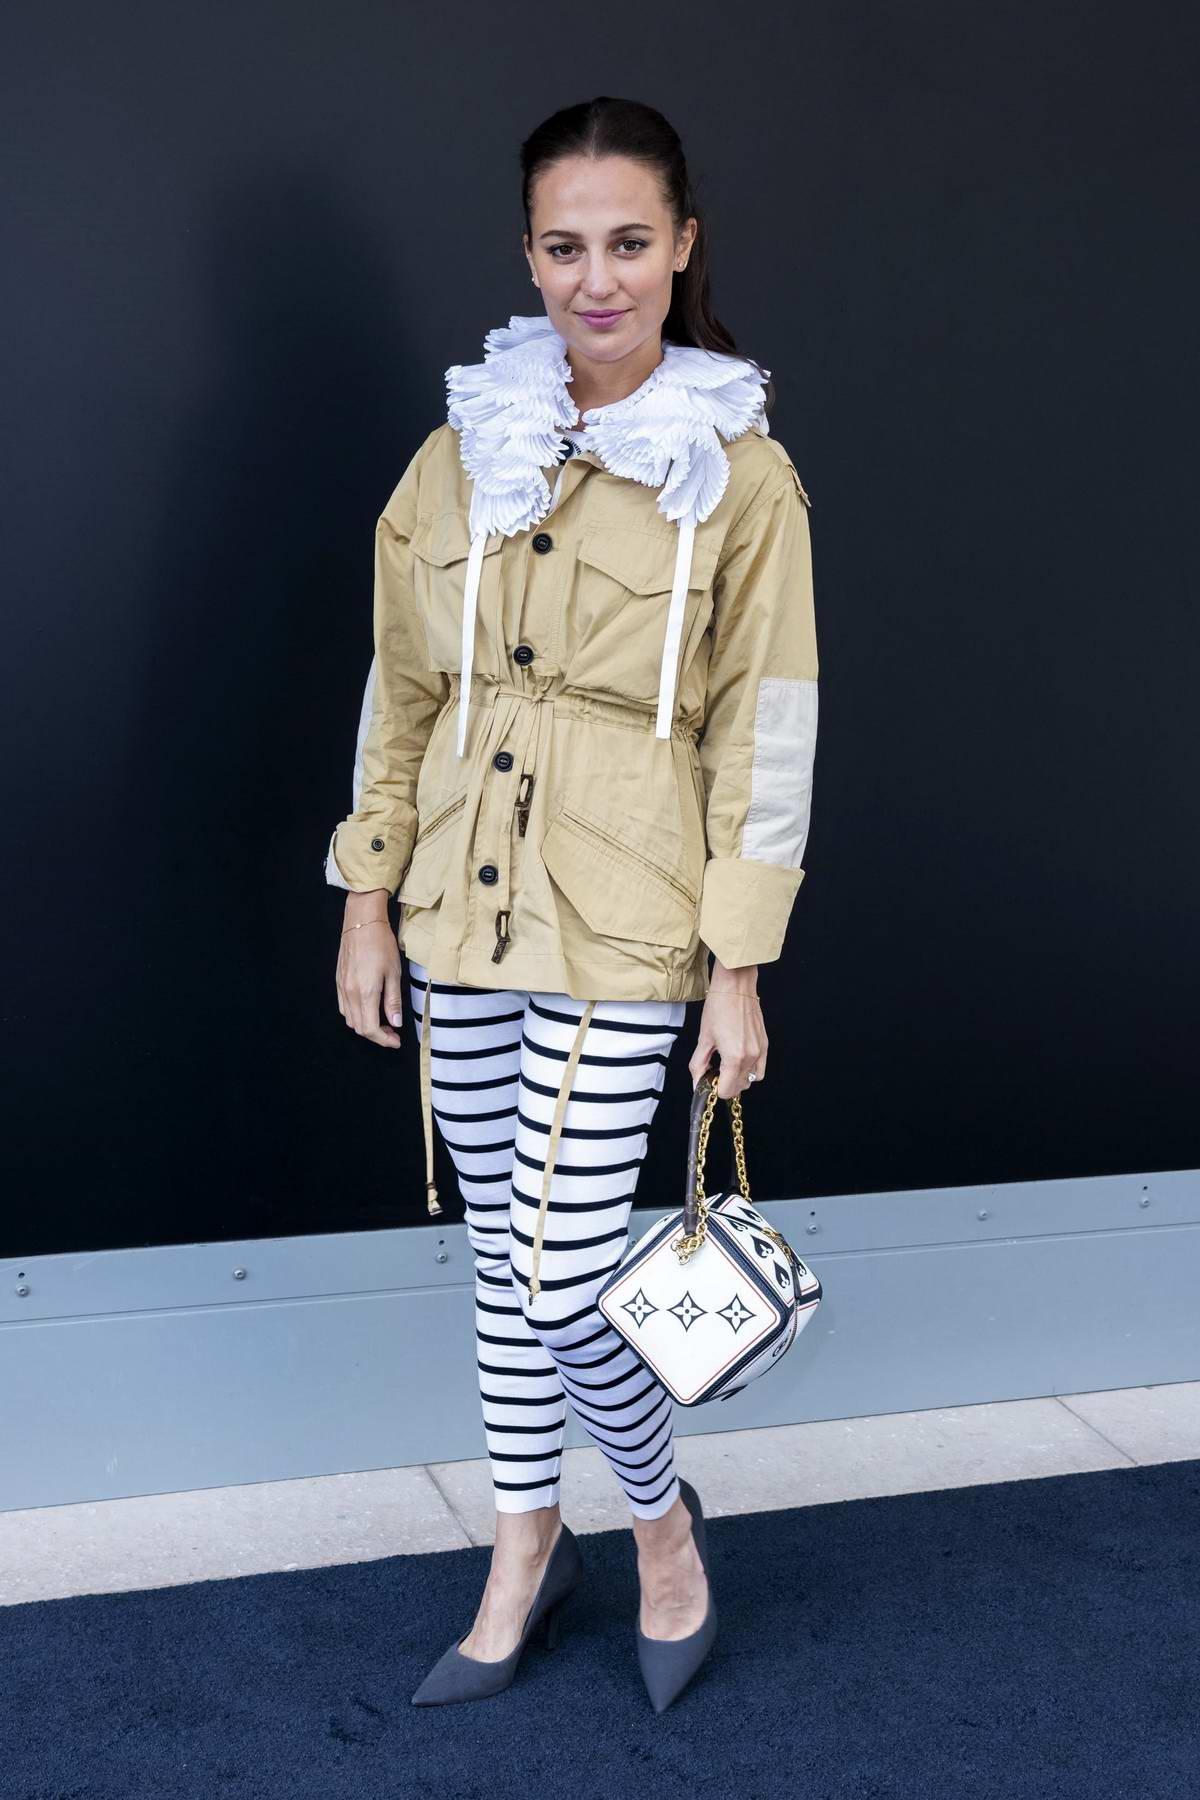 Alicia Vikander attends the Louis Vuitton Spring-Summer 2021 Show during Paris Fashion Week in Paris, France